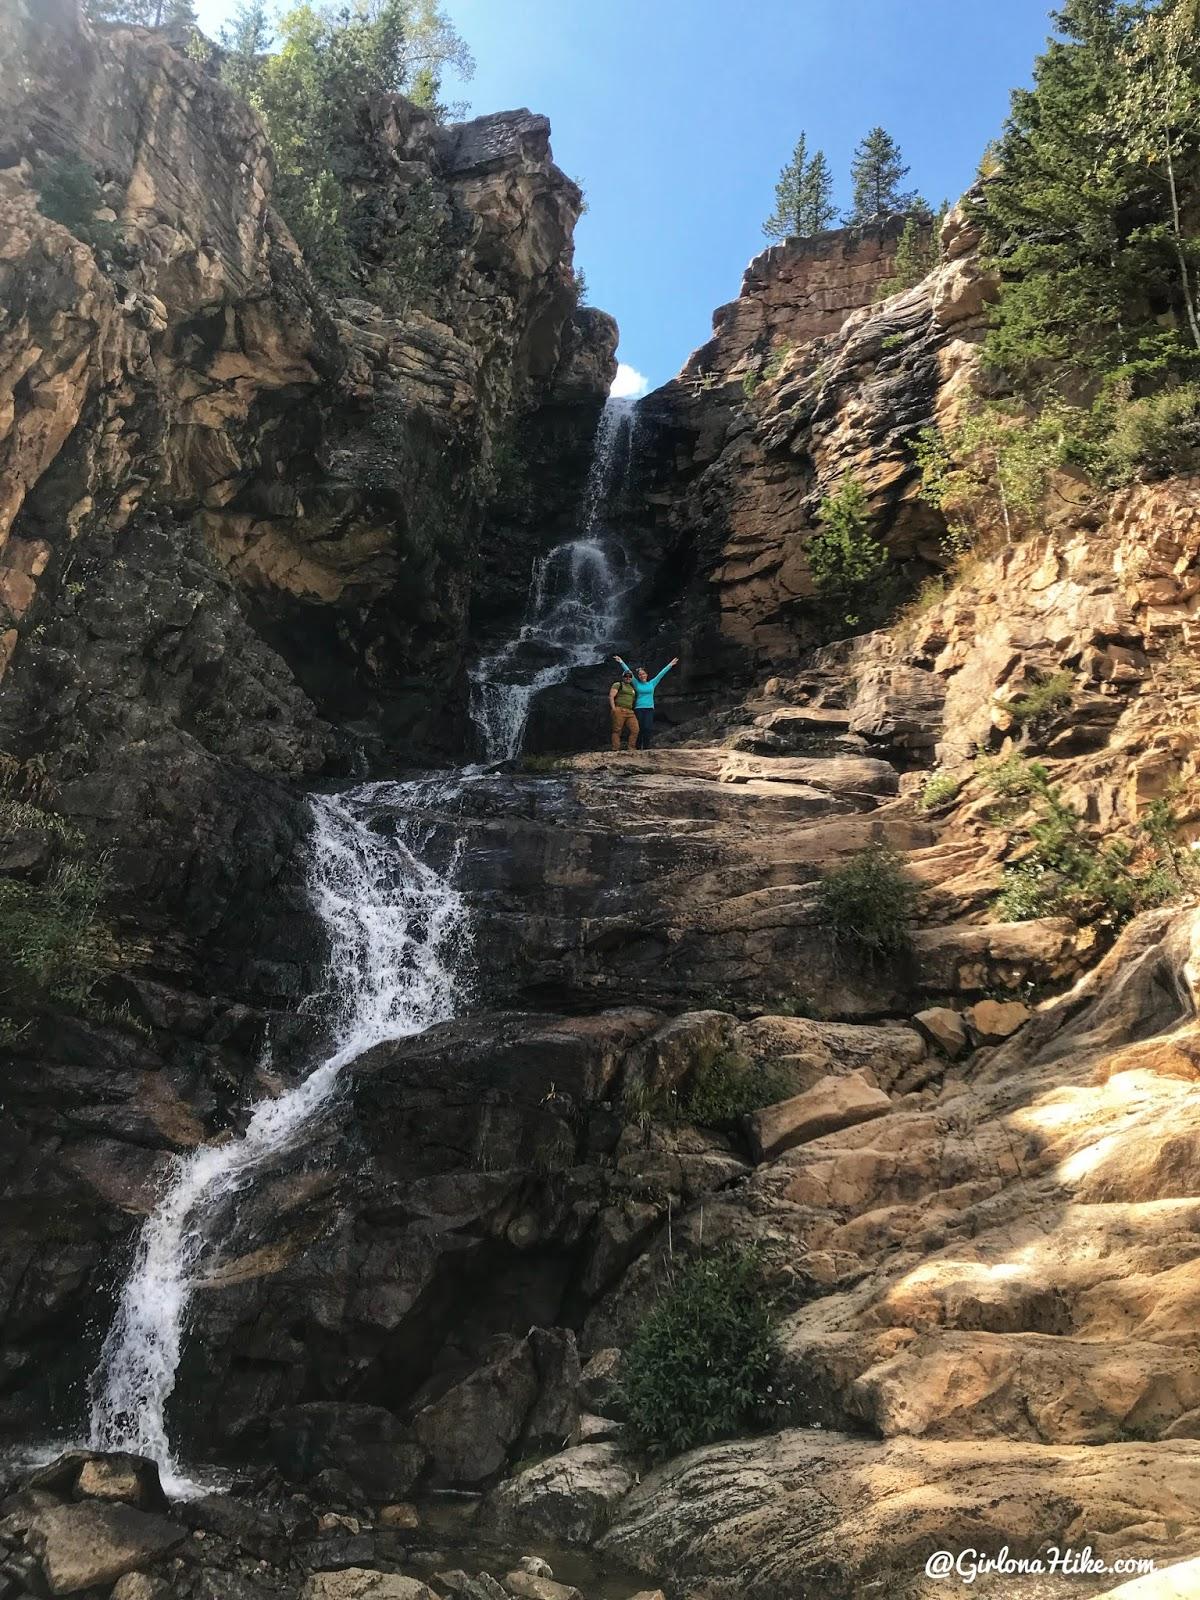 Exploring the Cataract Gorge, Uintas